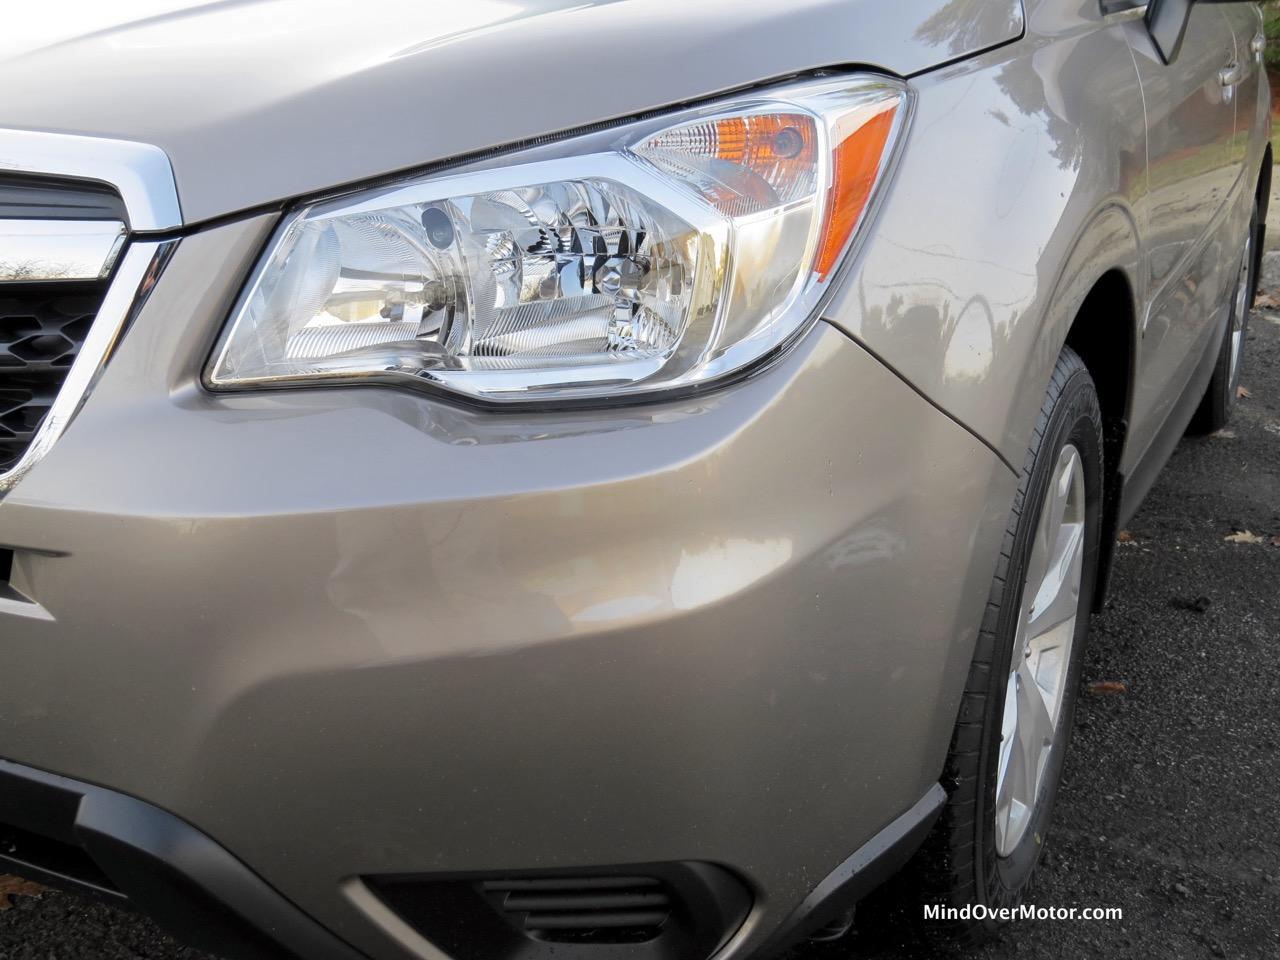 2015 Subaru Forester Headlight